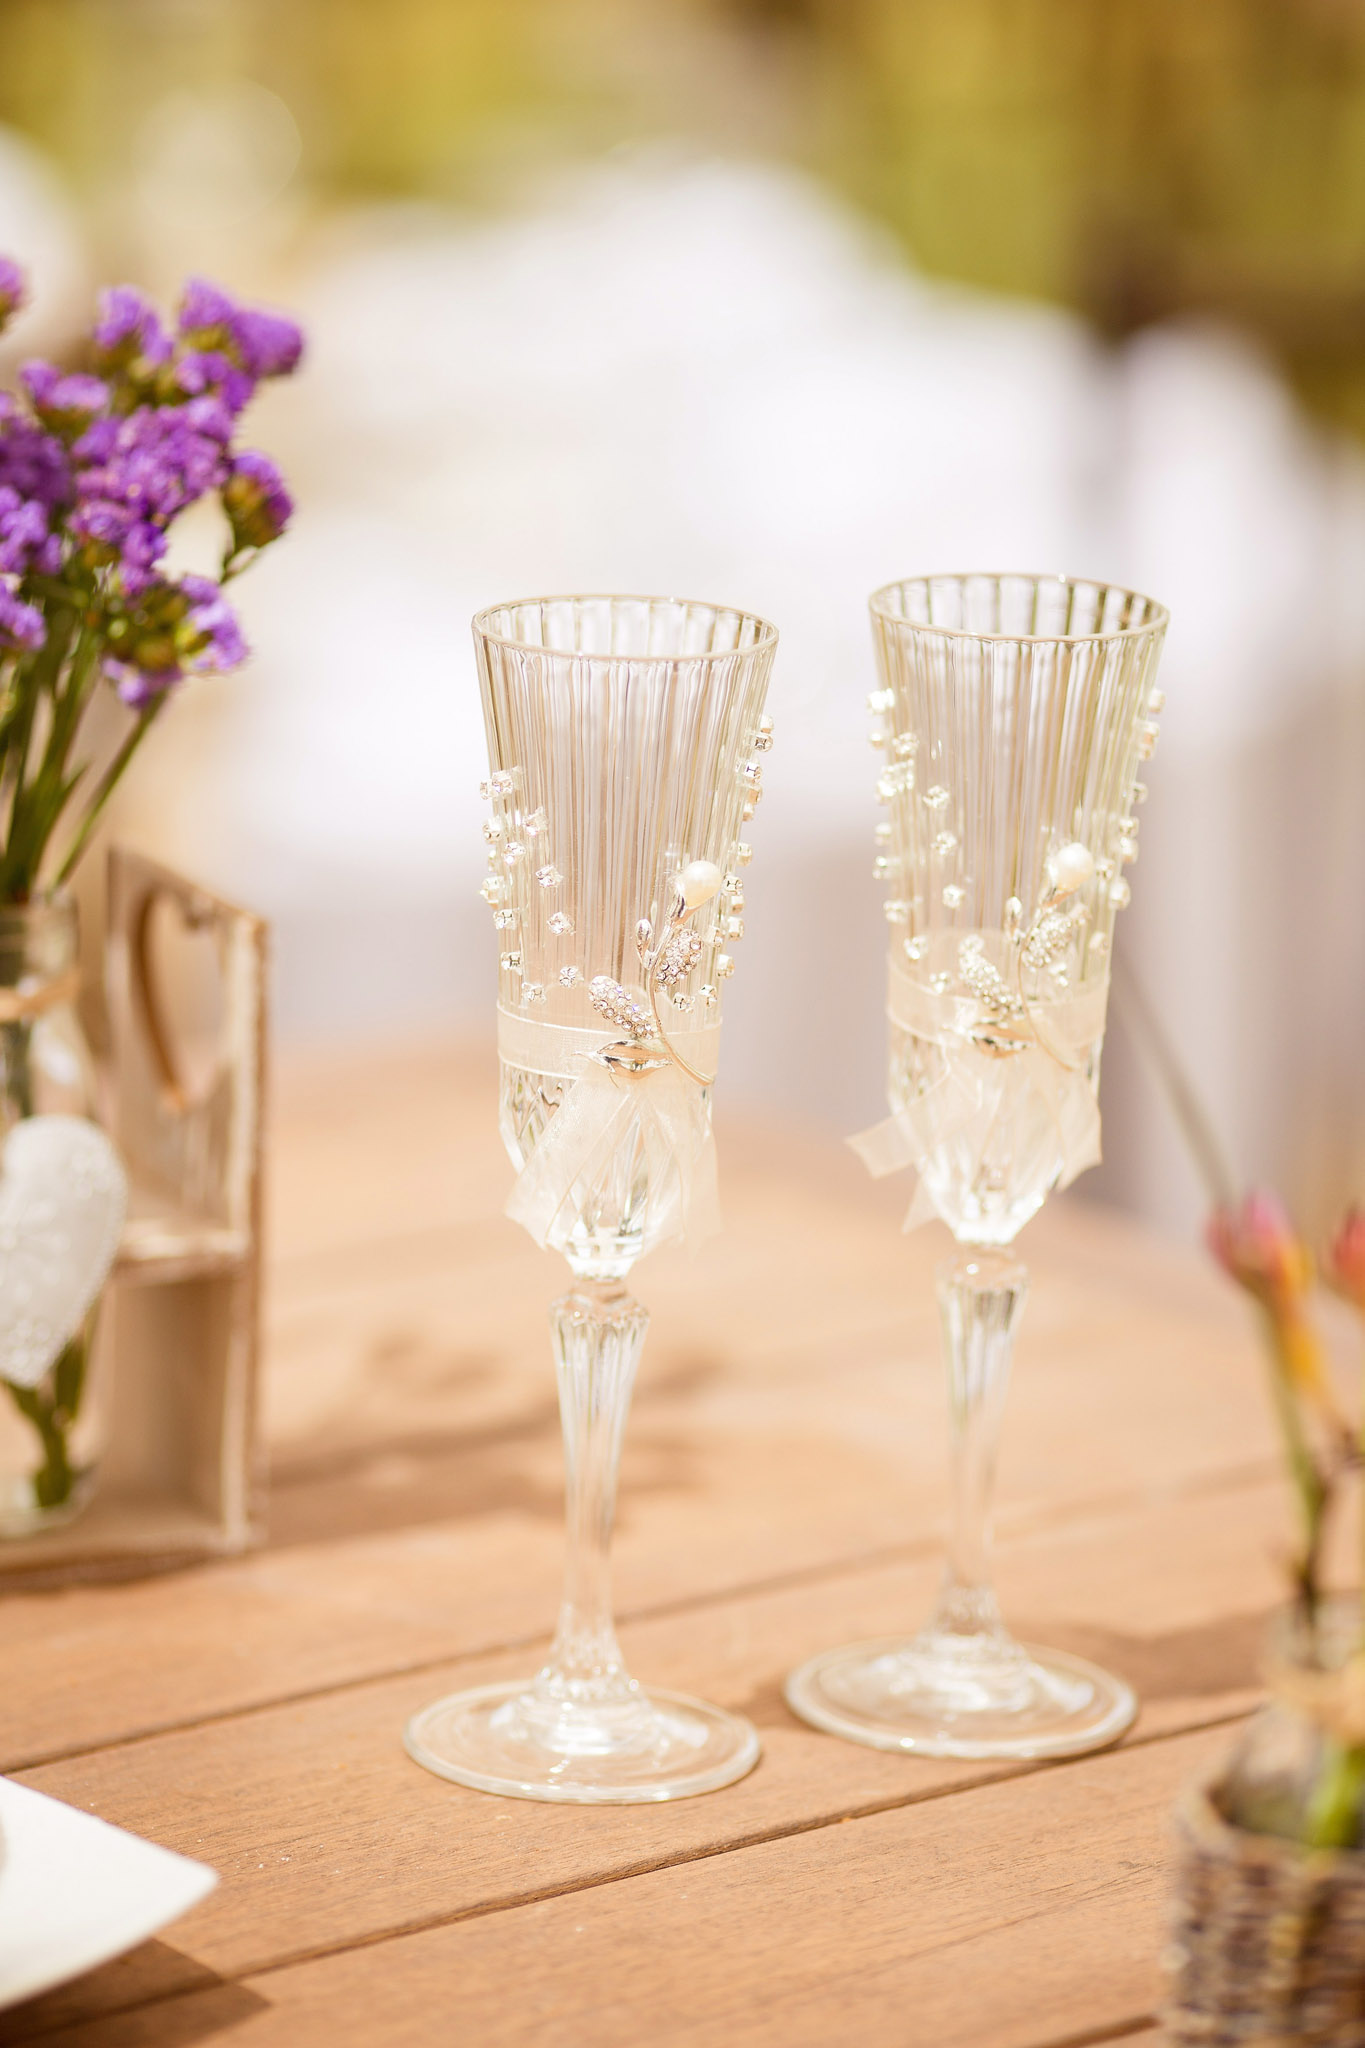 Wedding-Travellers-Destination-Wedding-Peru-Cusco-Hacienda-Sarapampa-Sacred-Valley-champagne-glasses-flutes